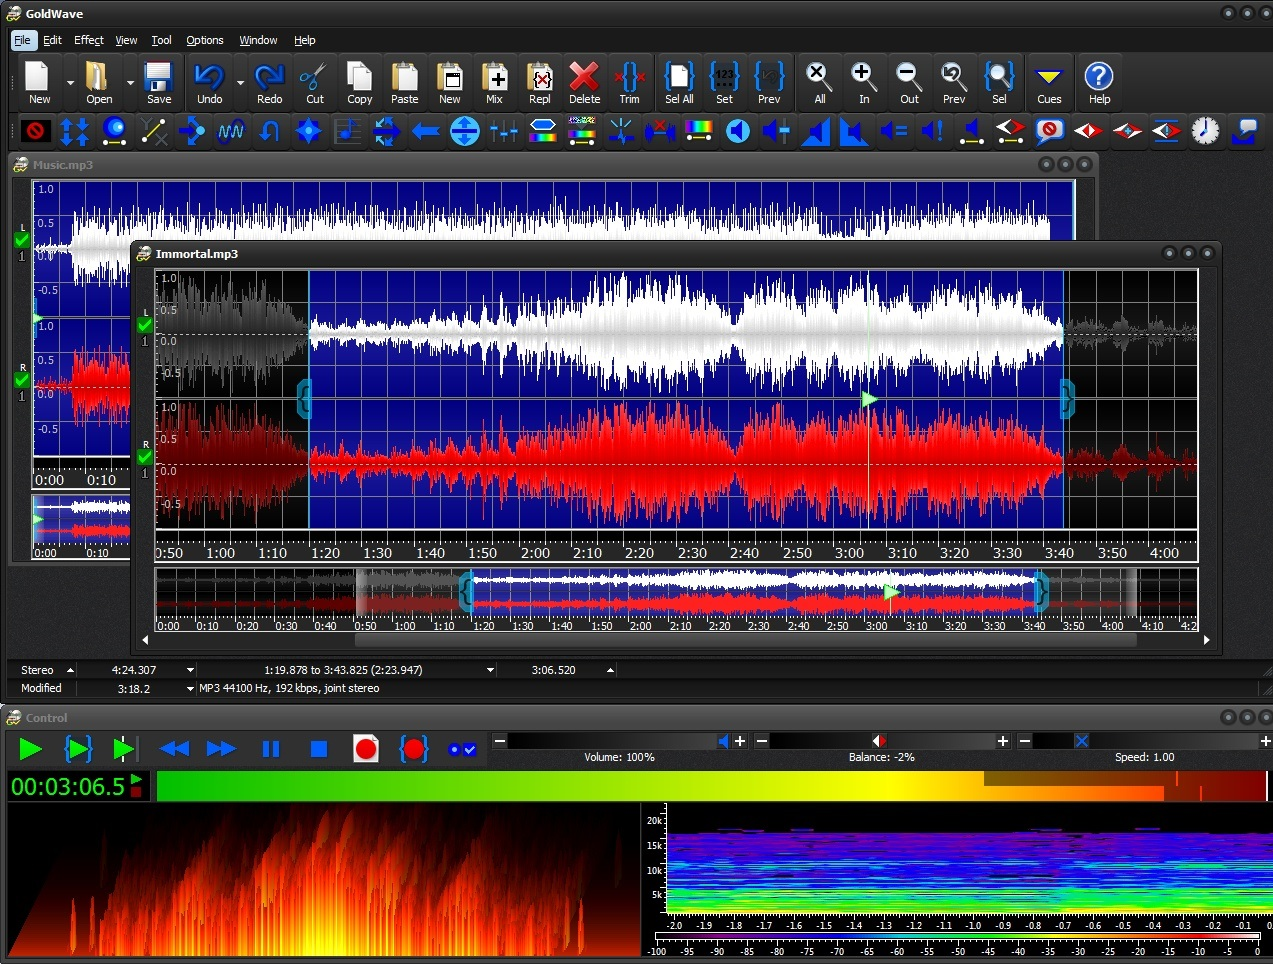 GoldWave 6 Crack _ Audio & Video Editing Software Free